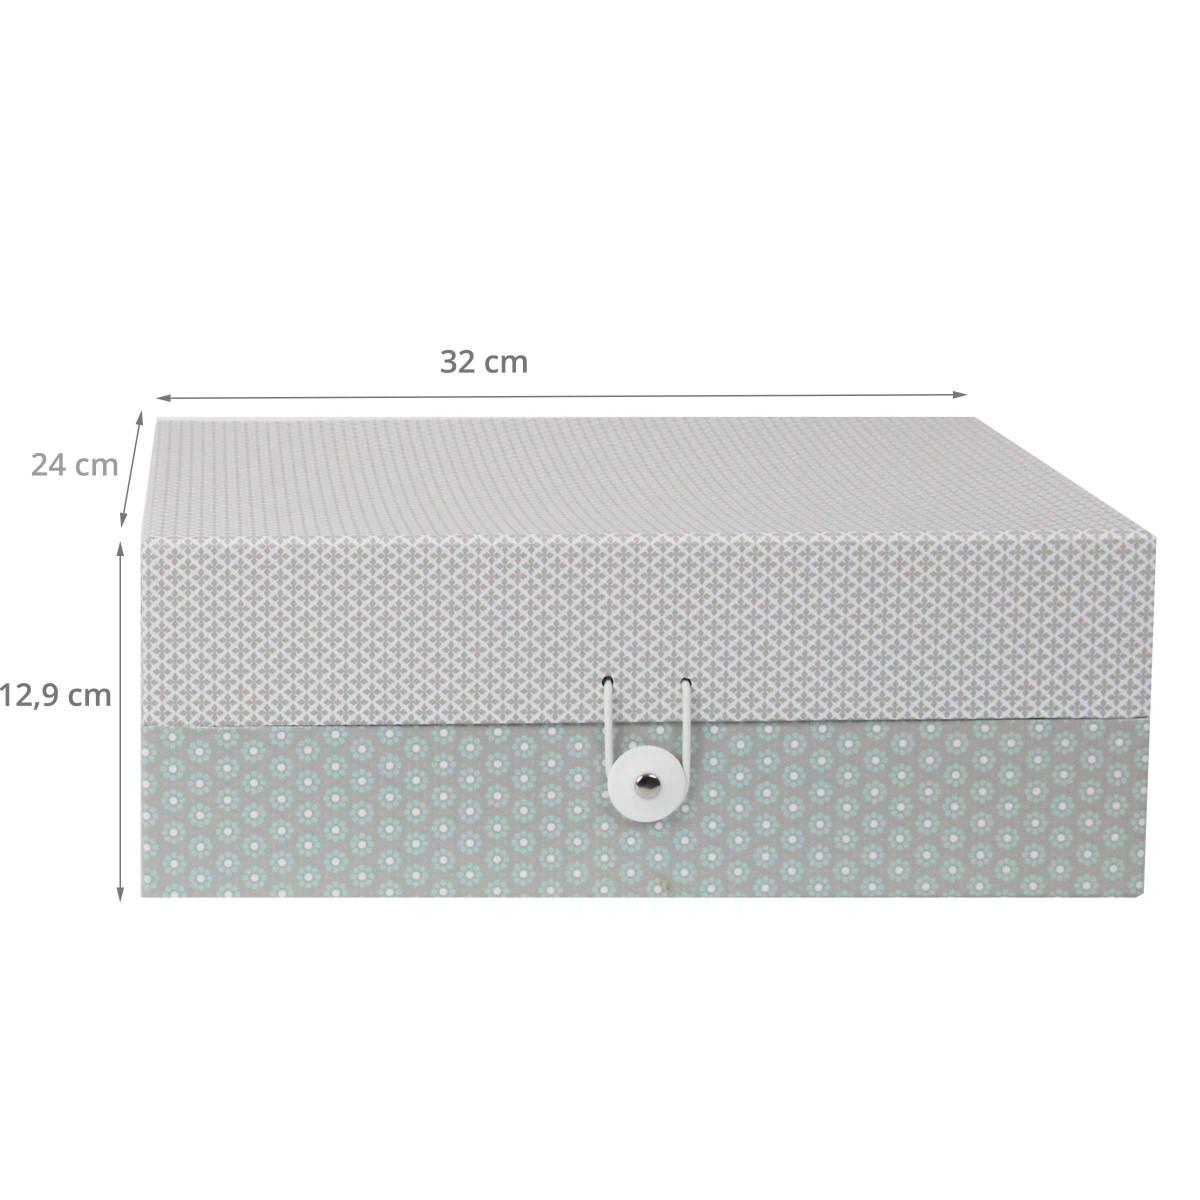 bo te de rangement en carton motifs gris. Black Bedroom Furniture Sets. Home Design Ideas